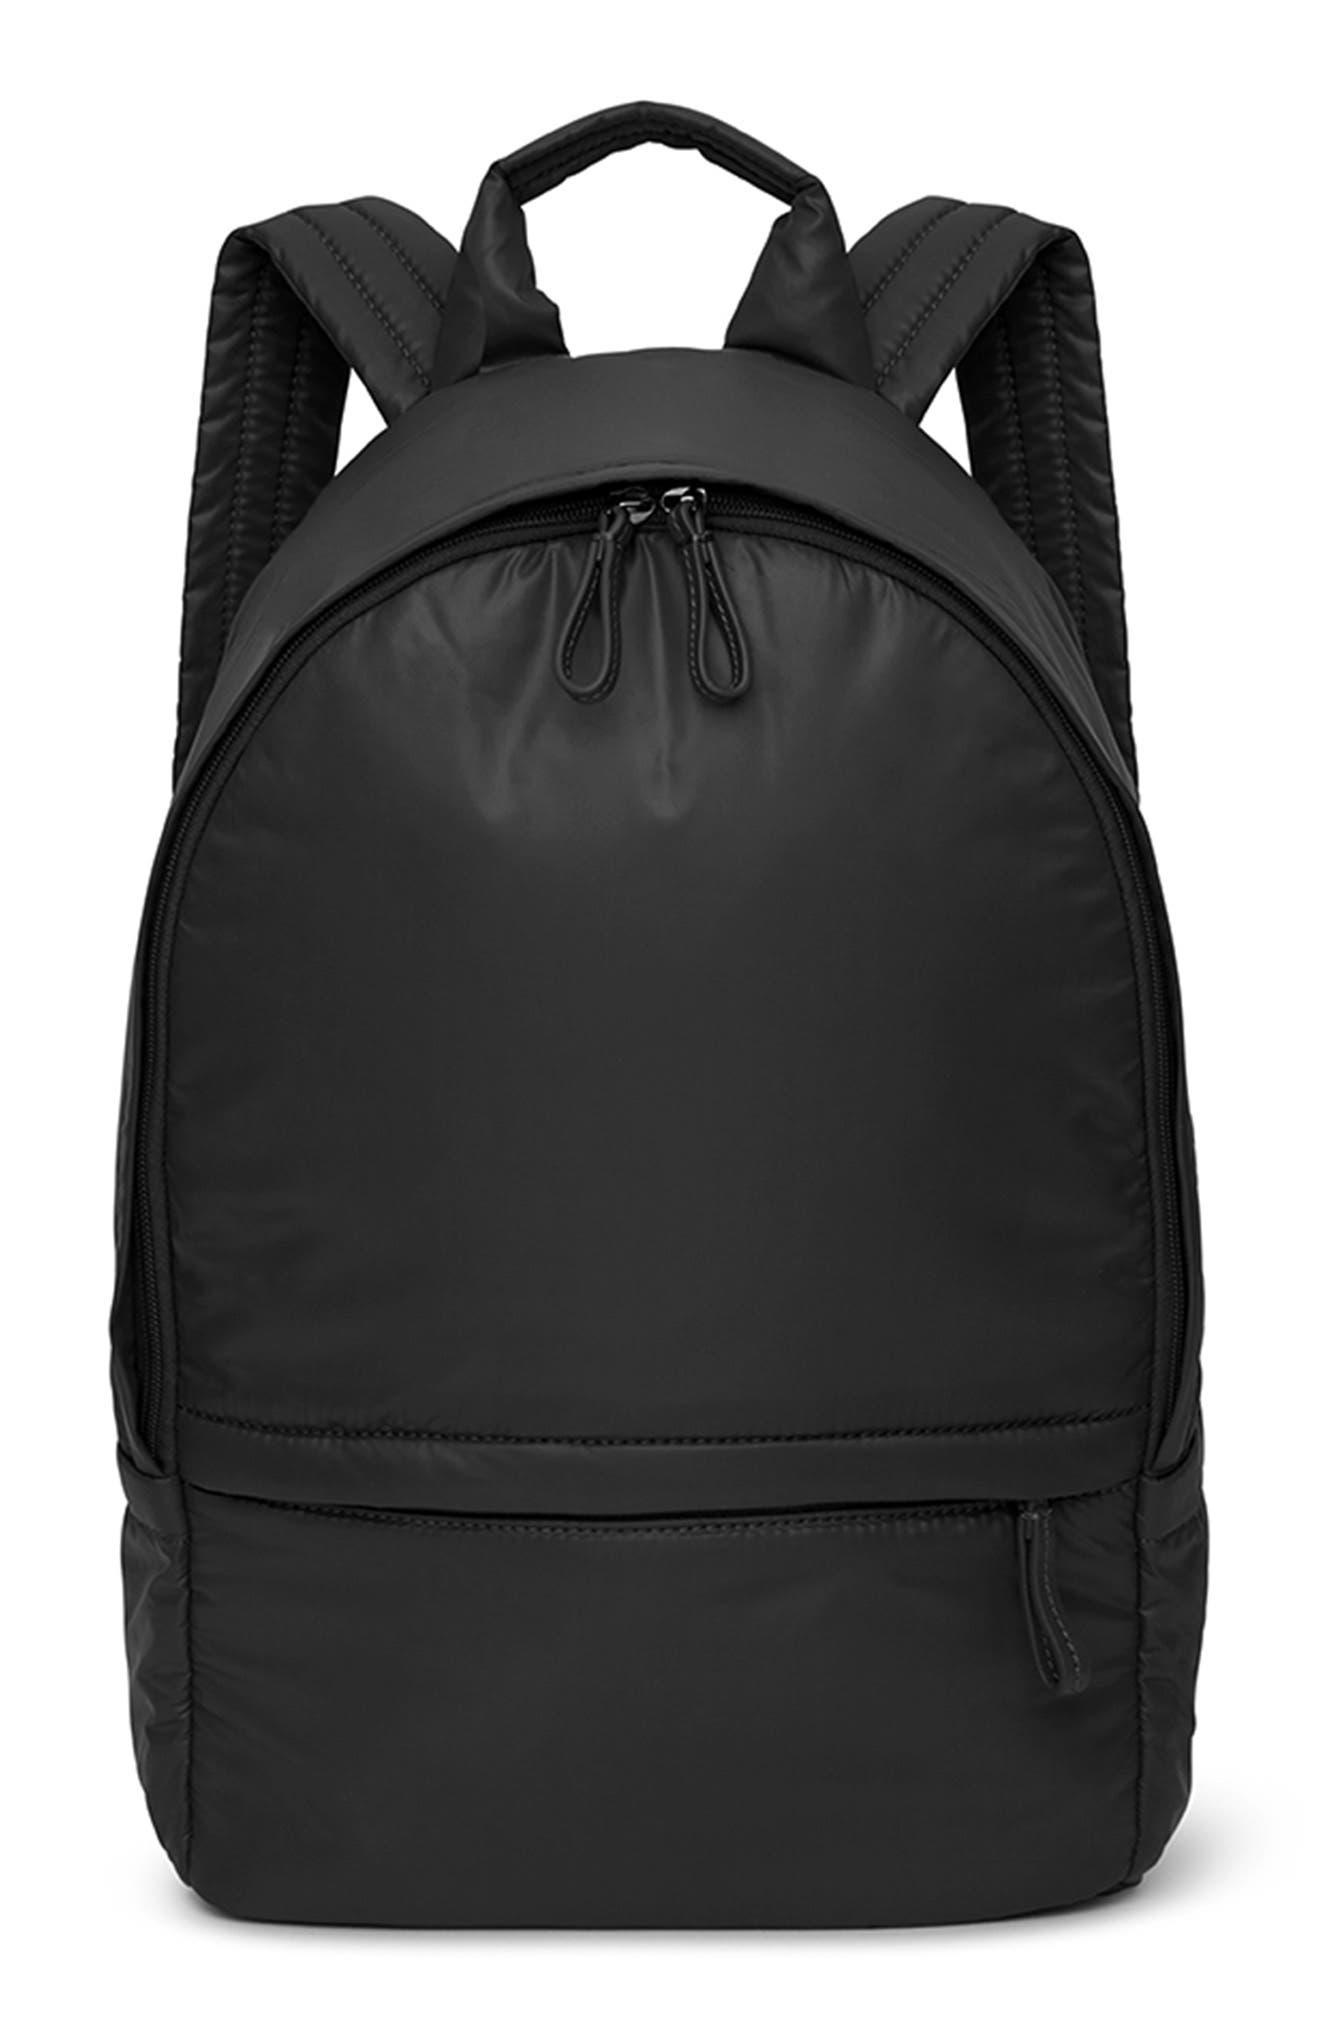 CARAA, Stratus Waterproof Backpack, Main thumbnail 1, color, BLACK